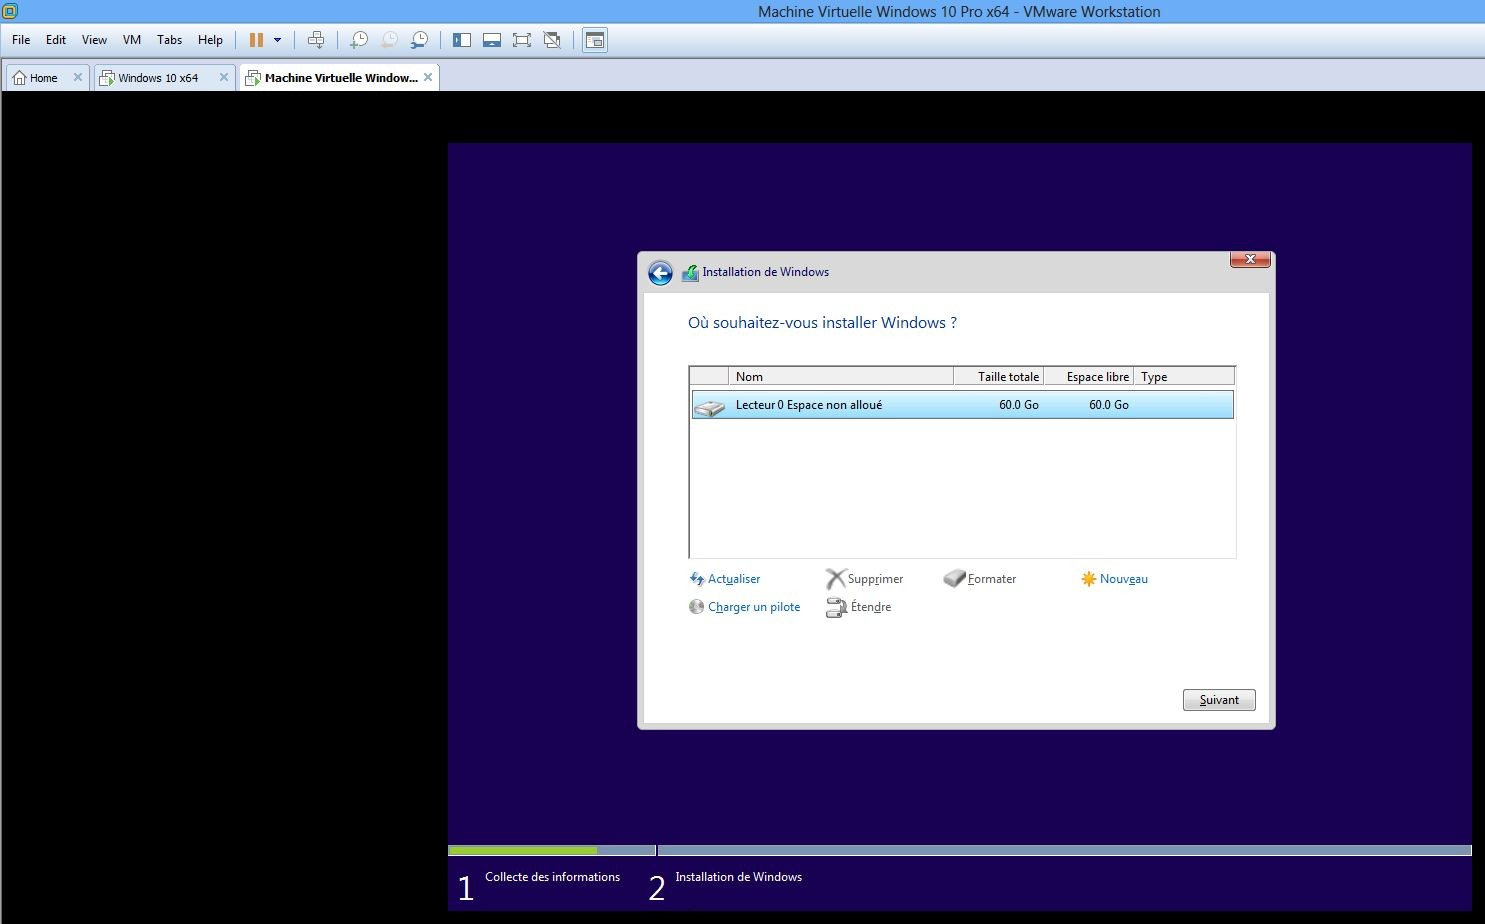 Ecran installation 1 et formatage lecteur 0 non alloué 60Go